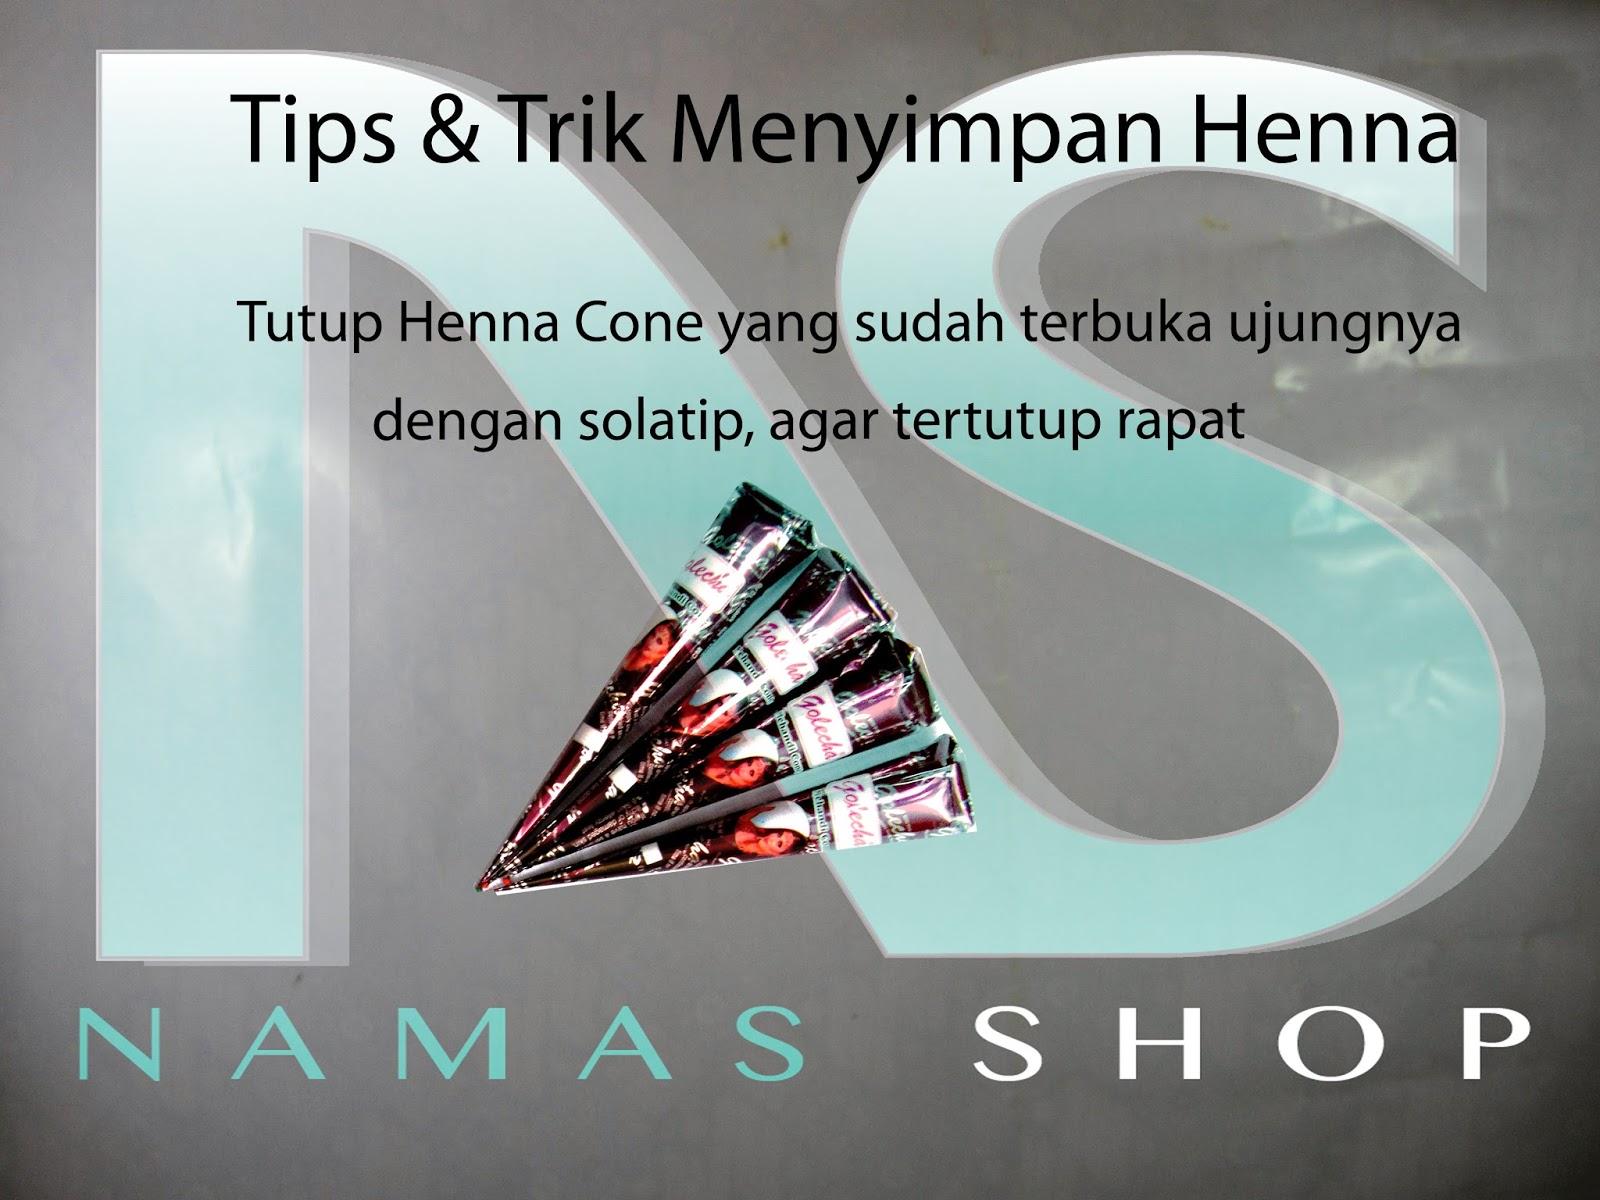 Namasshop Tips Amp Trik About Henna